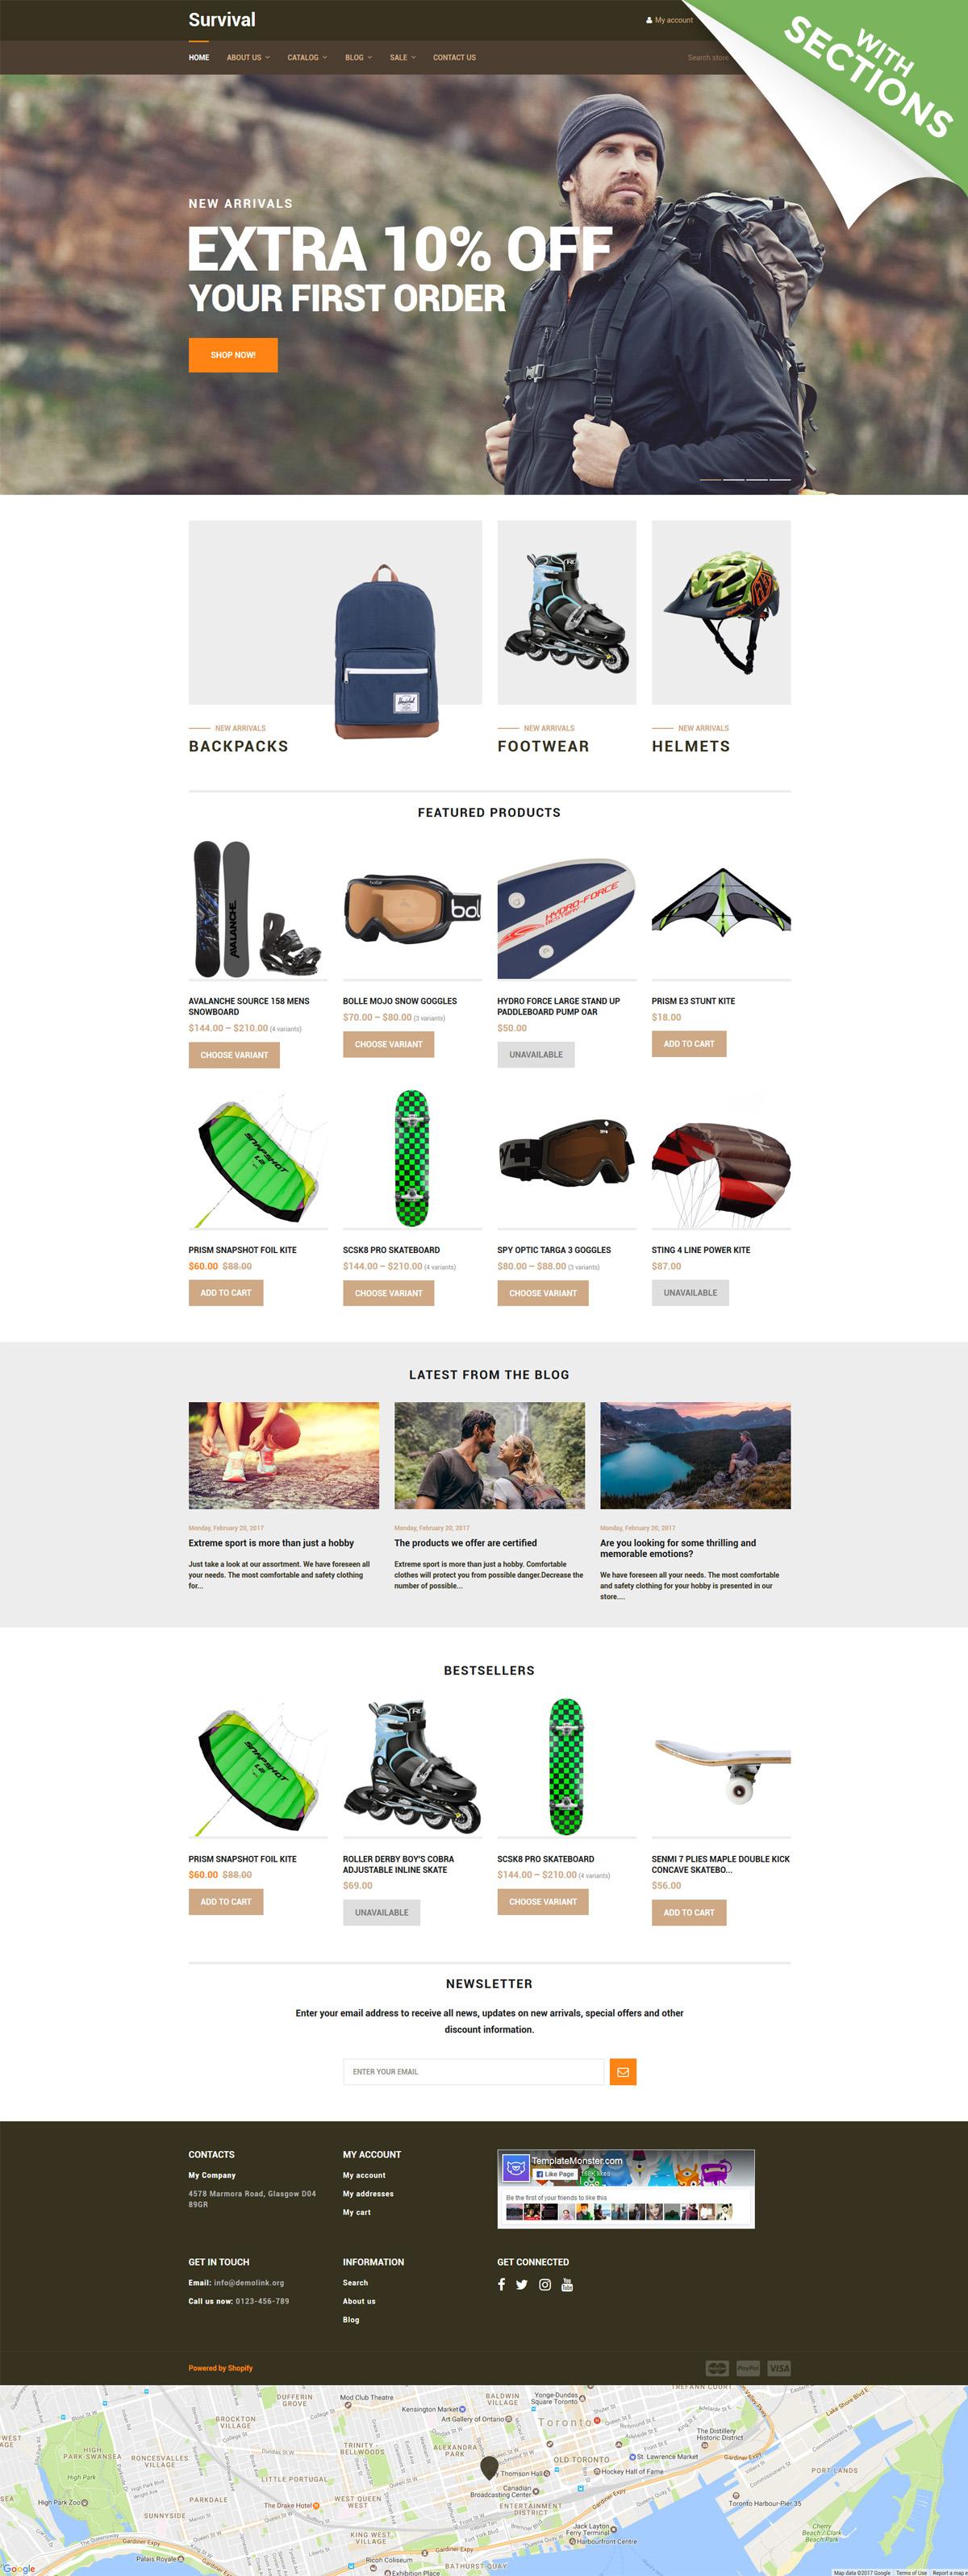 Survival - Travel Equipment Shopify Theme - screenshot